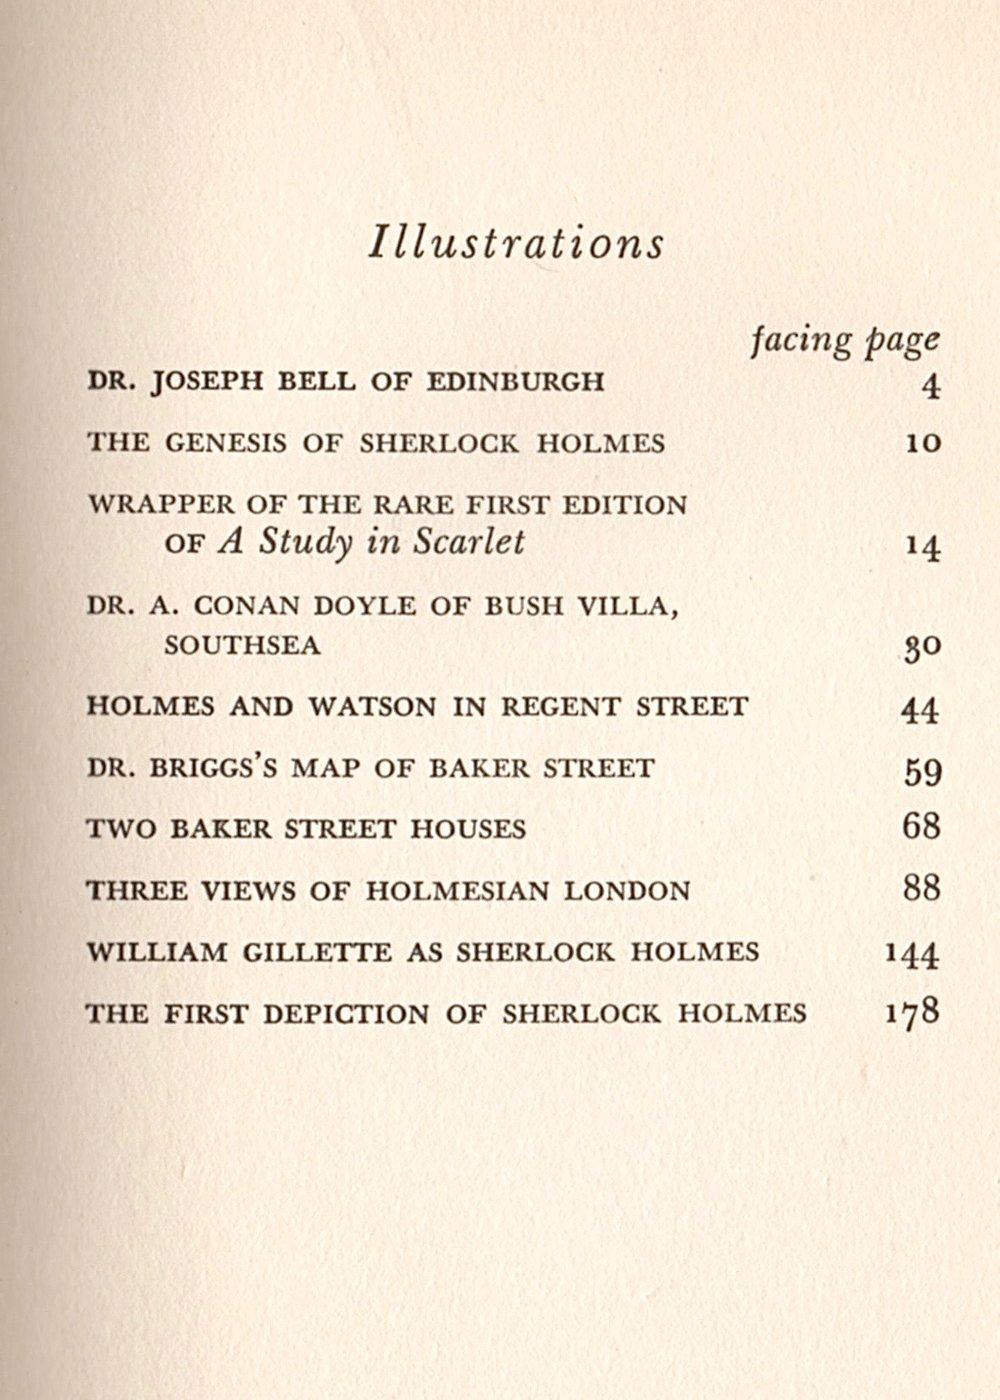 TPLOSH 1934 illus page.jpg